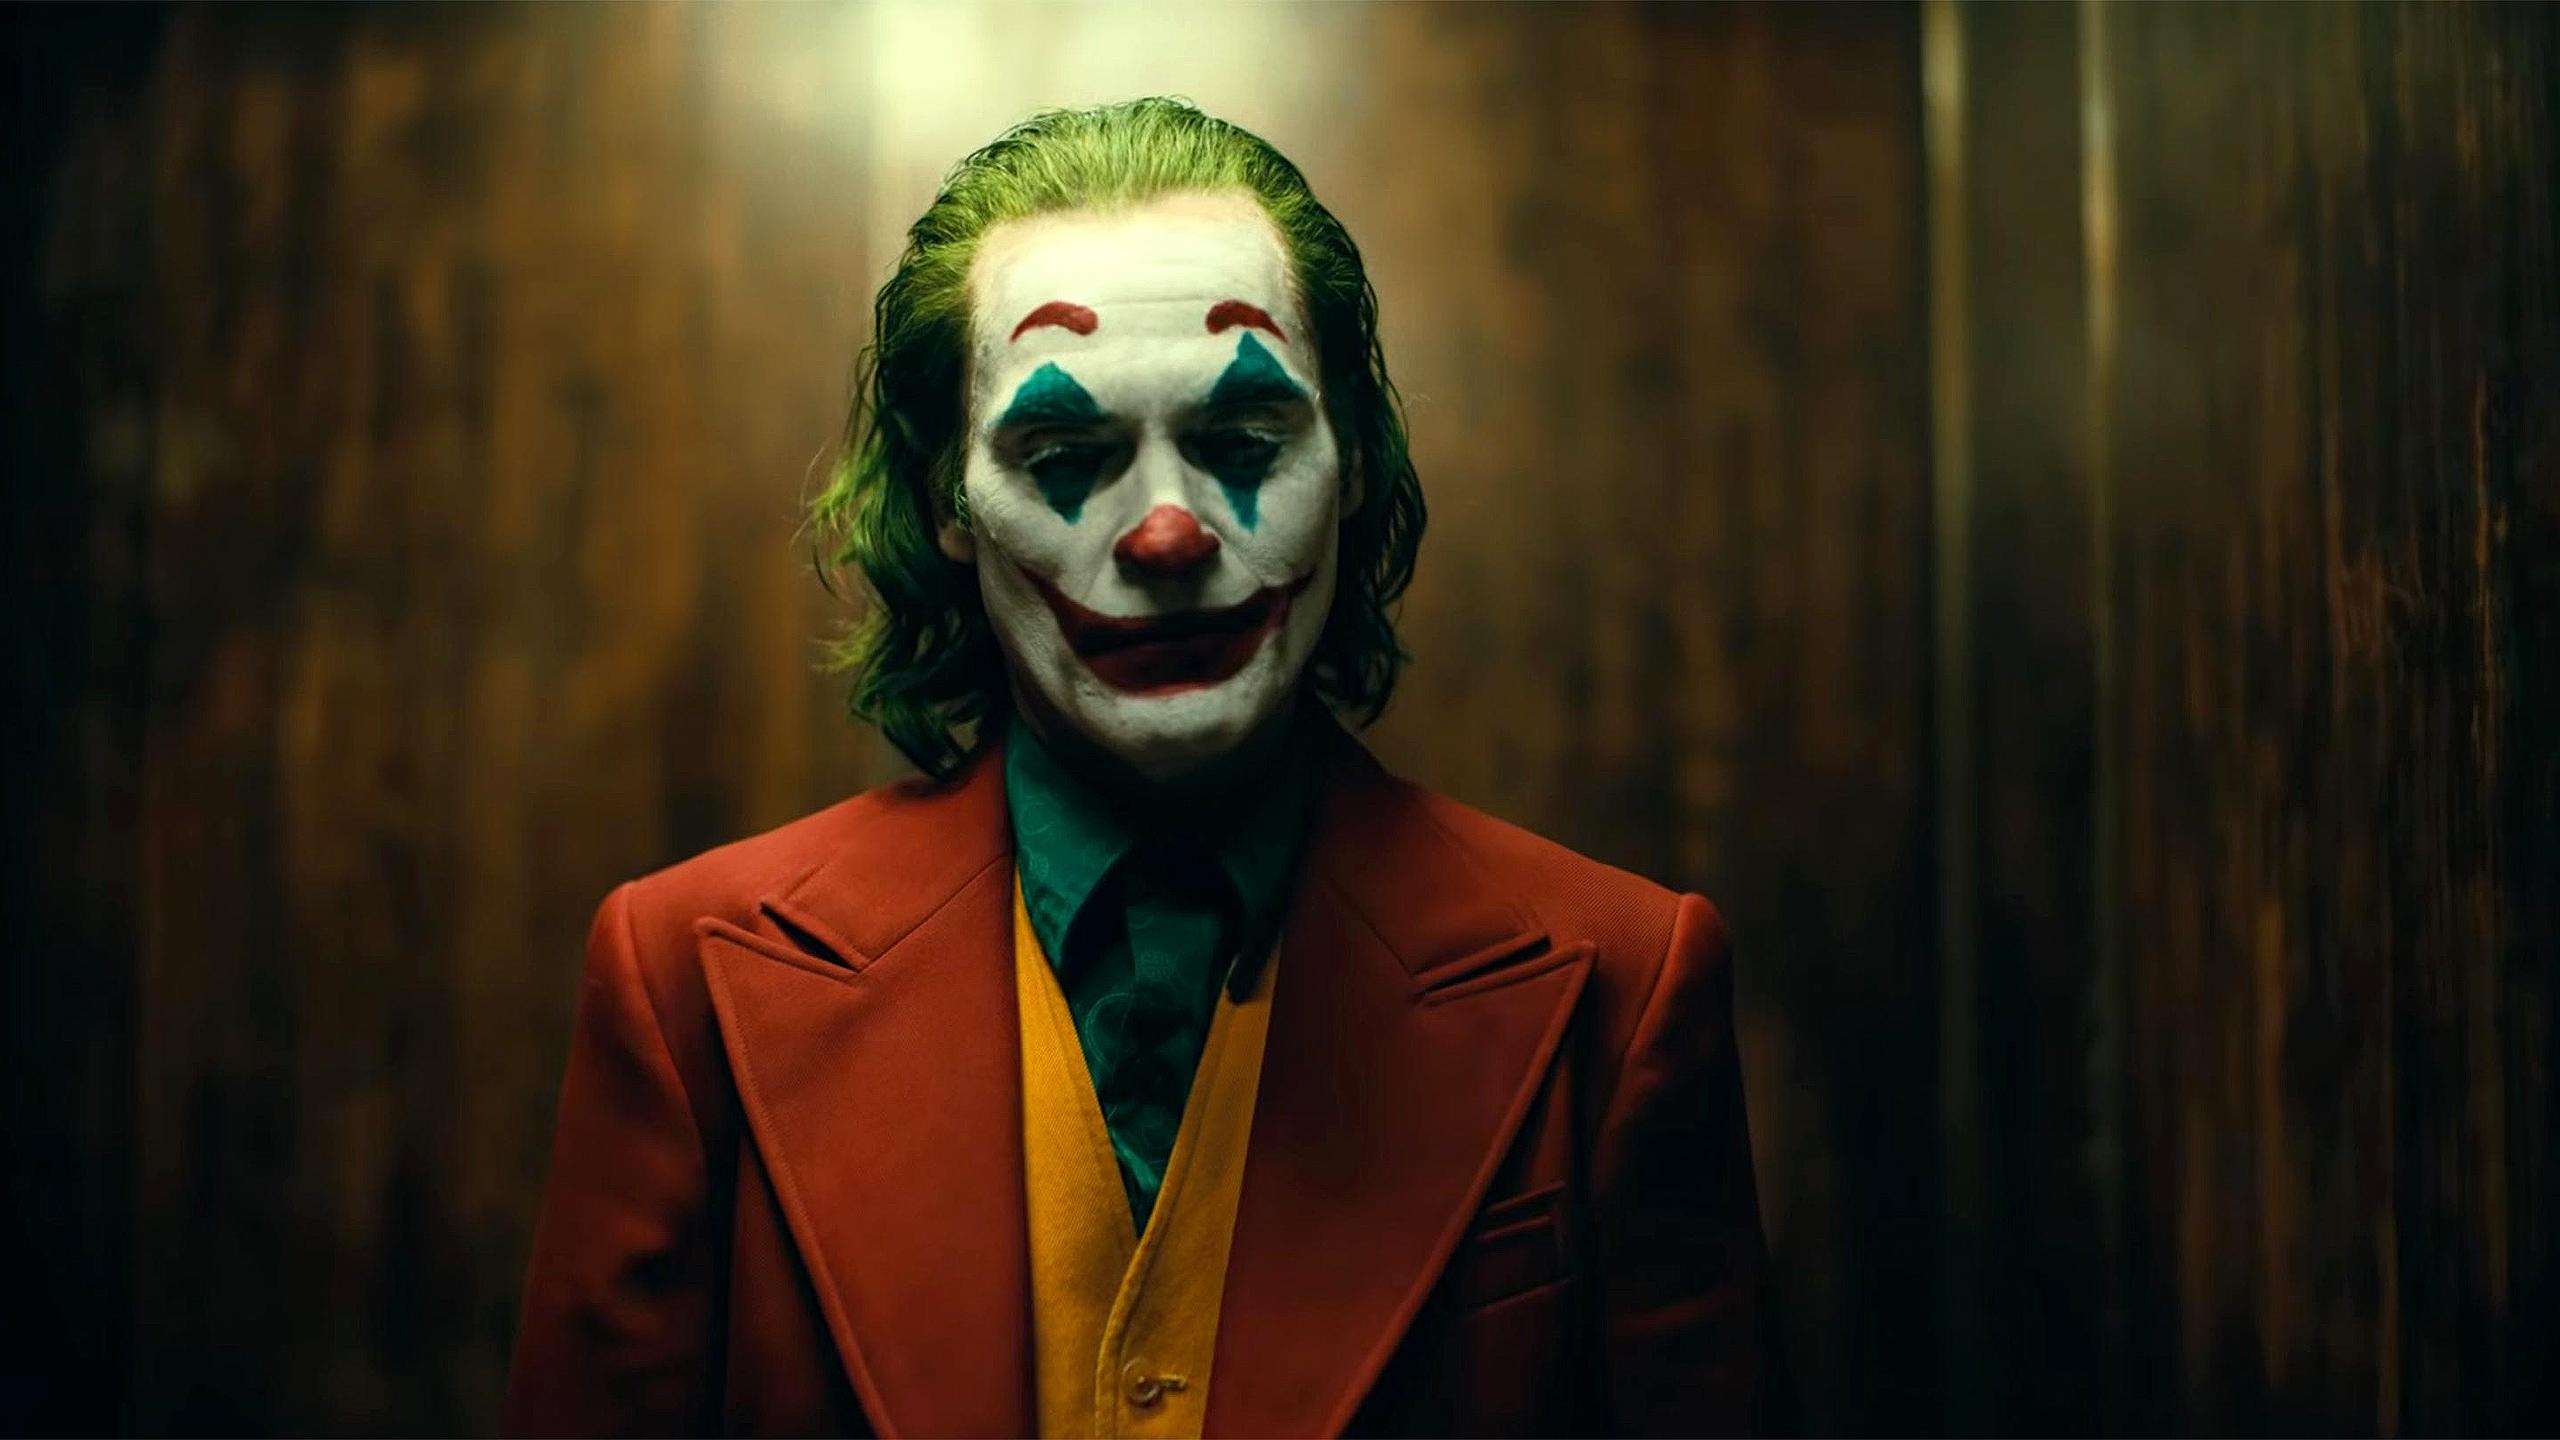 Joker 2019 Movies 4k Wallpapers - HD Wallpapers